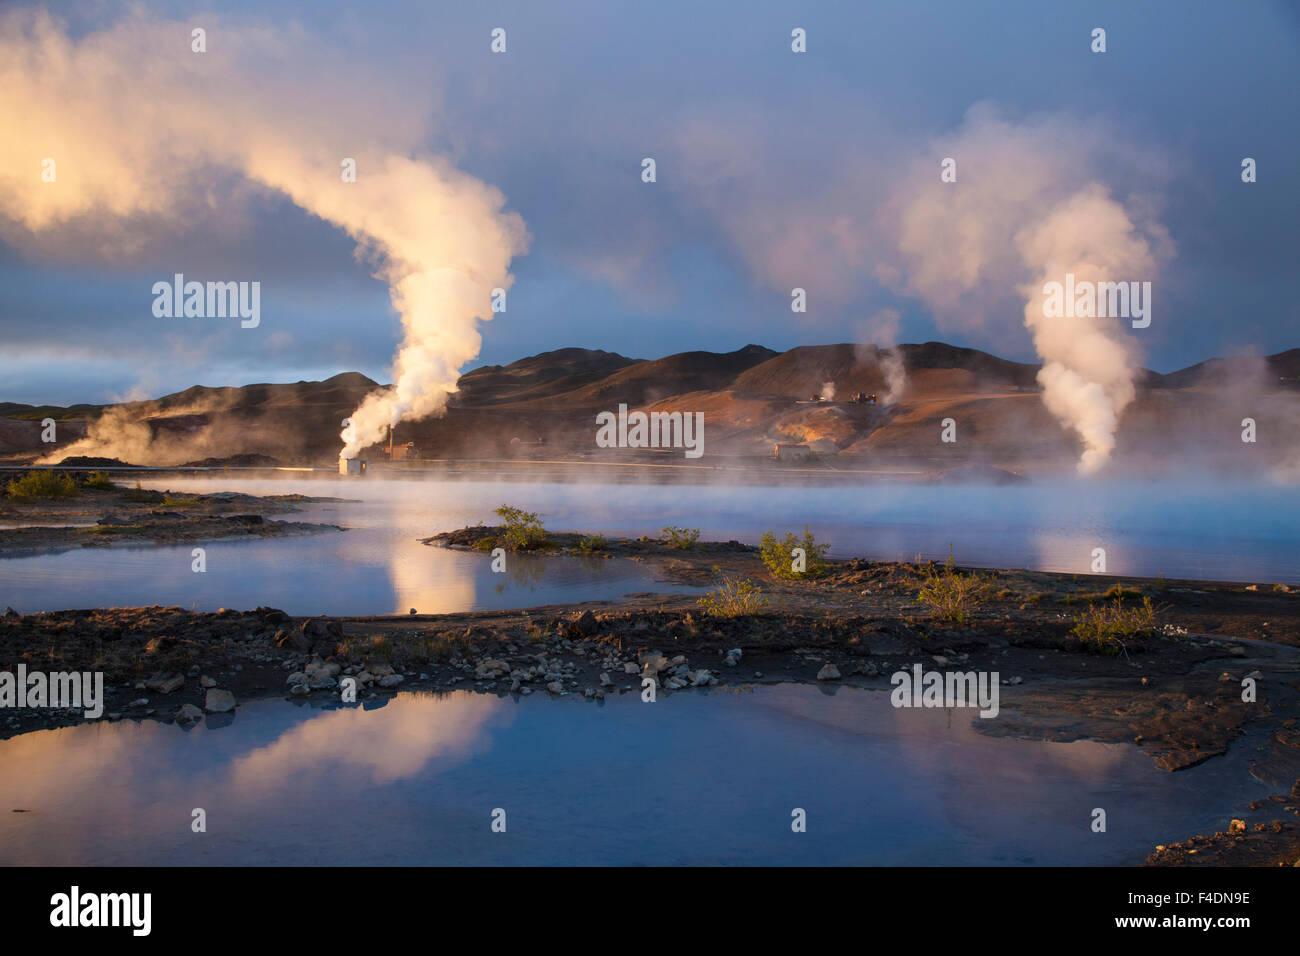 La luce del tramonto su Bjarnarflag stazione elettrica geotermica, Myvatn, Nordhurland Eystra, Islanda. Immagini Stock